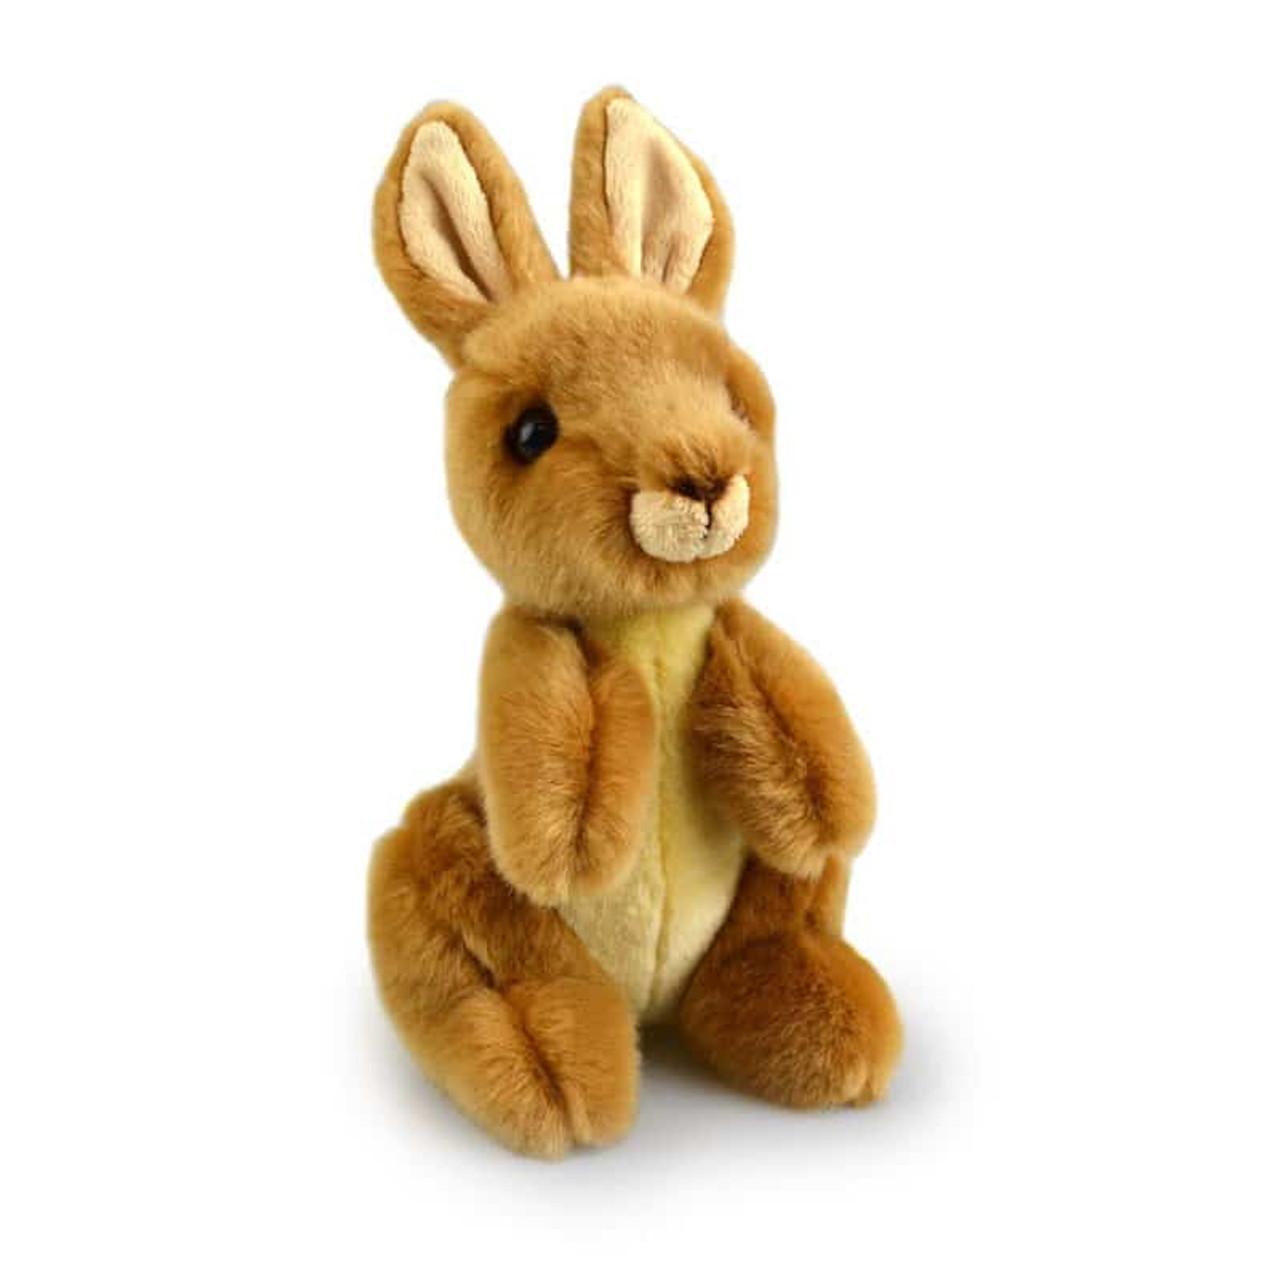 Korimco Lil Friends Plush Toy 18cm KANGAROO